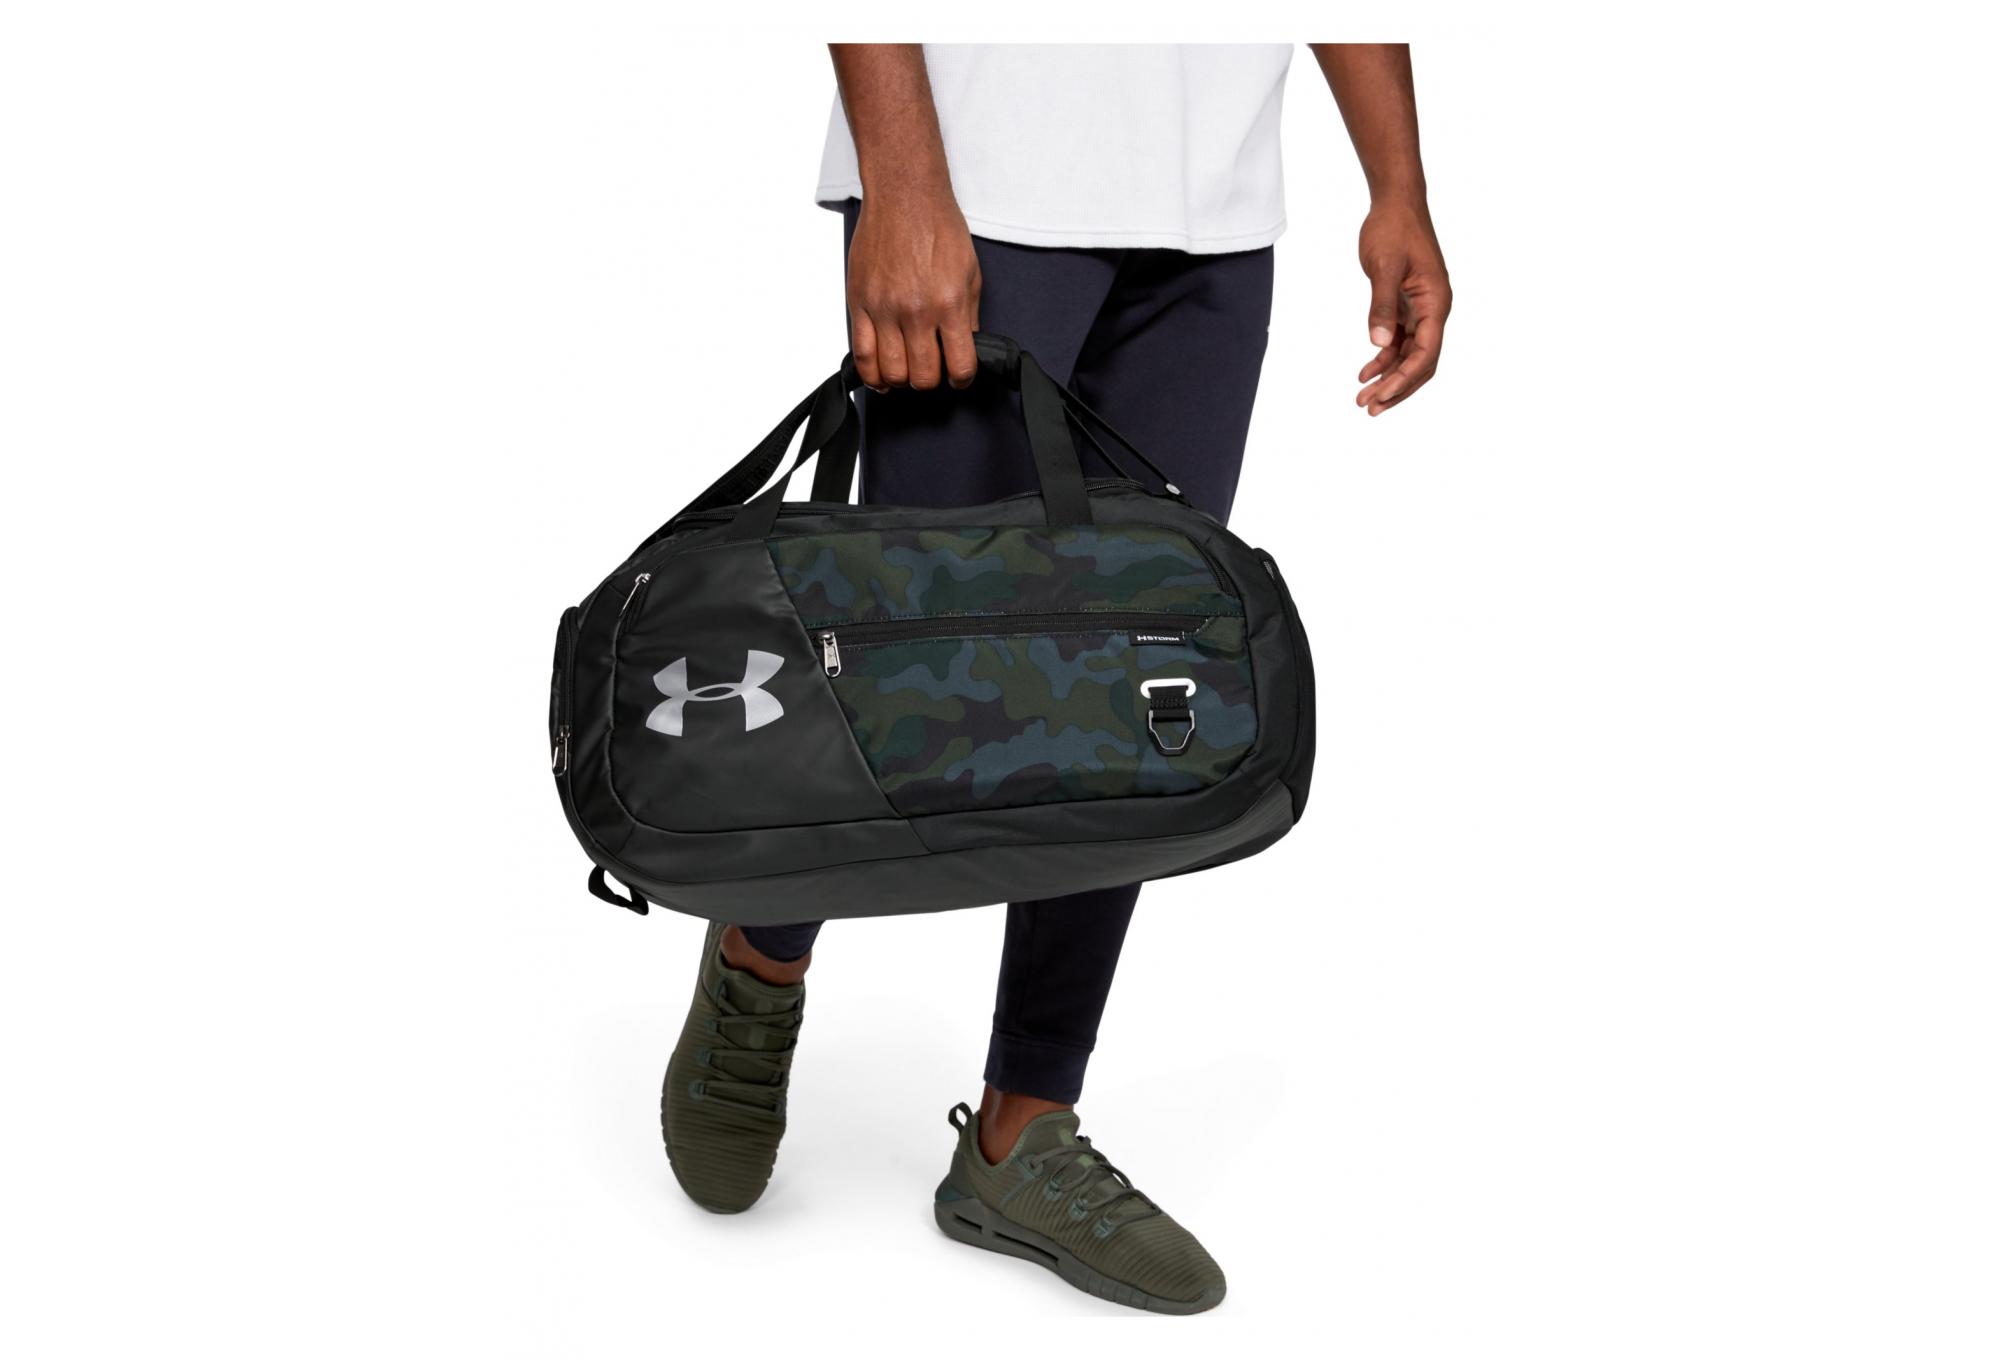 Small Duffle Bag Black Camo